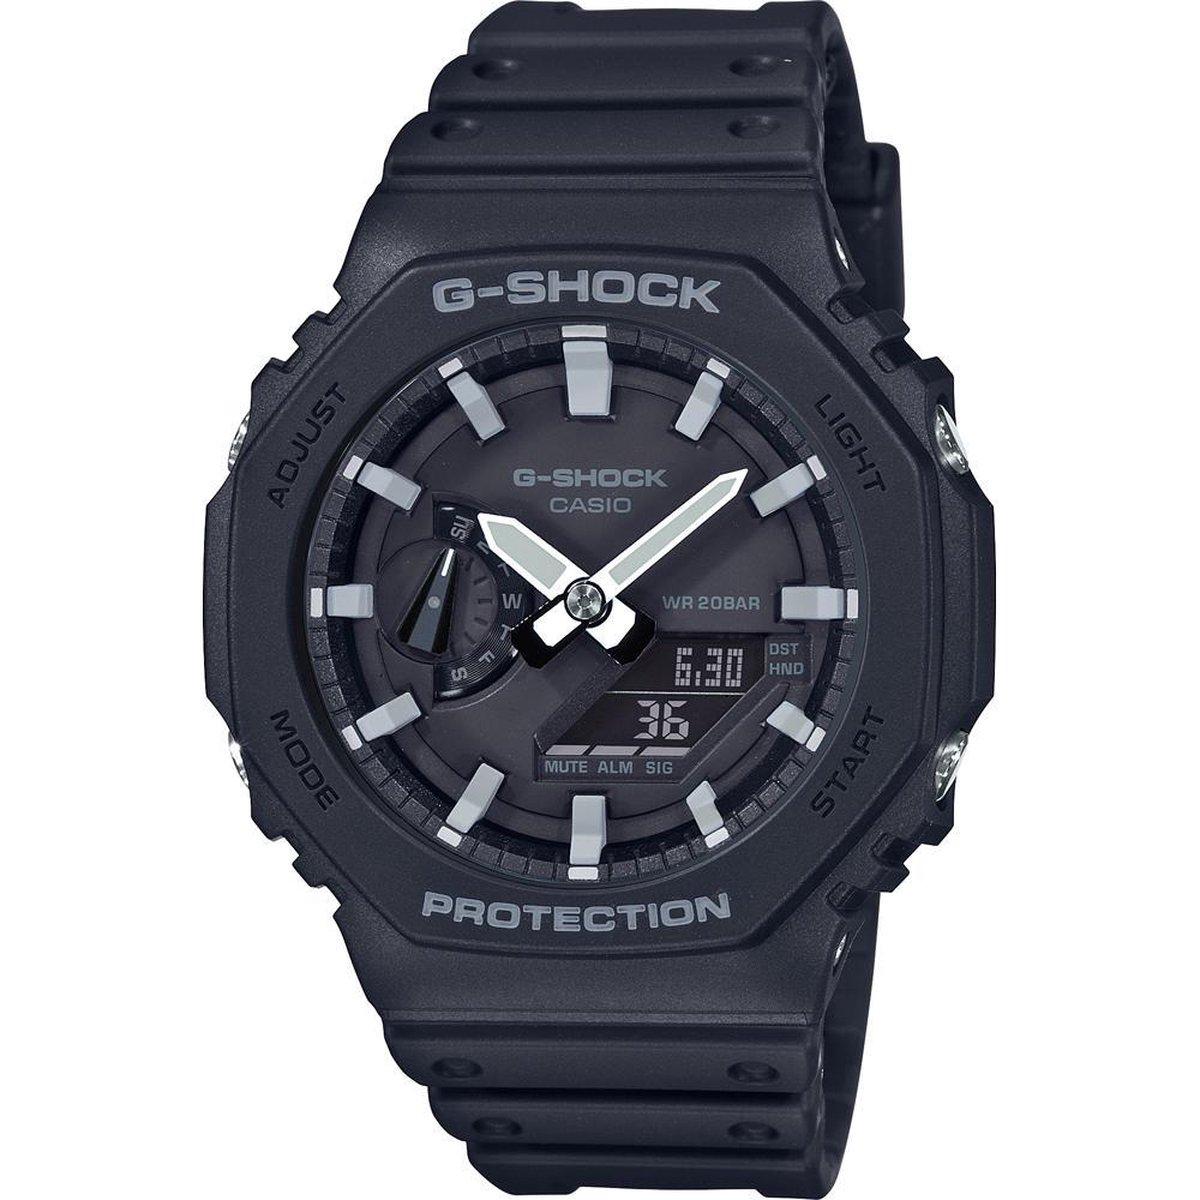 Casio G-Shock GA-2100-1AER Horloge - Kunststof - Zwart -   45 mm